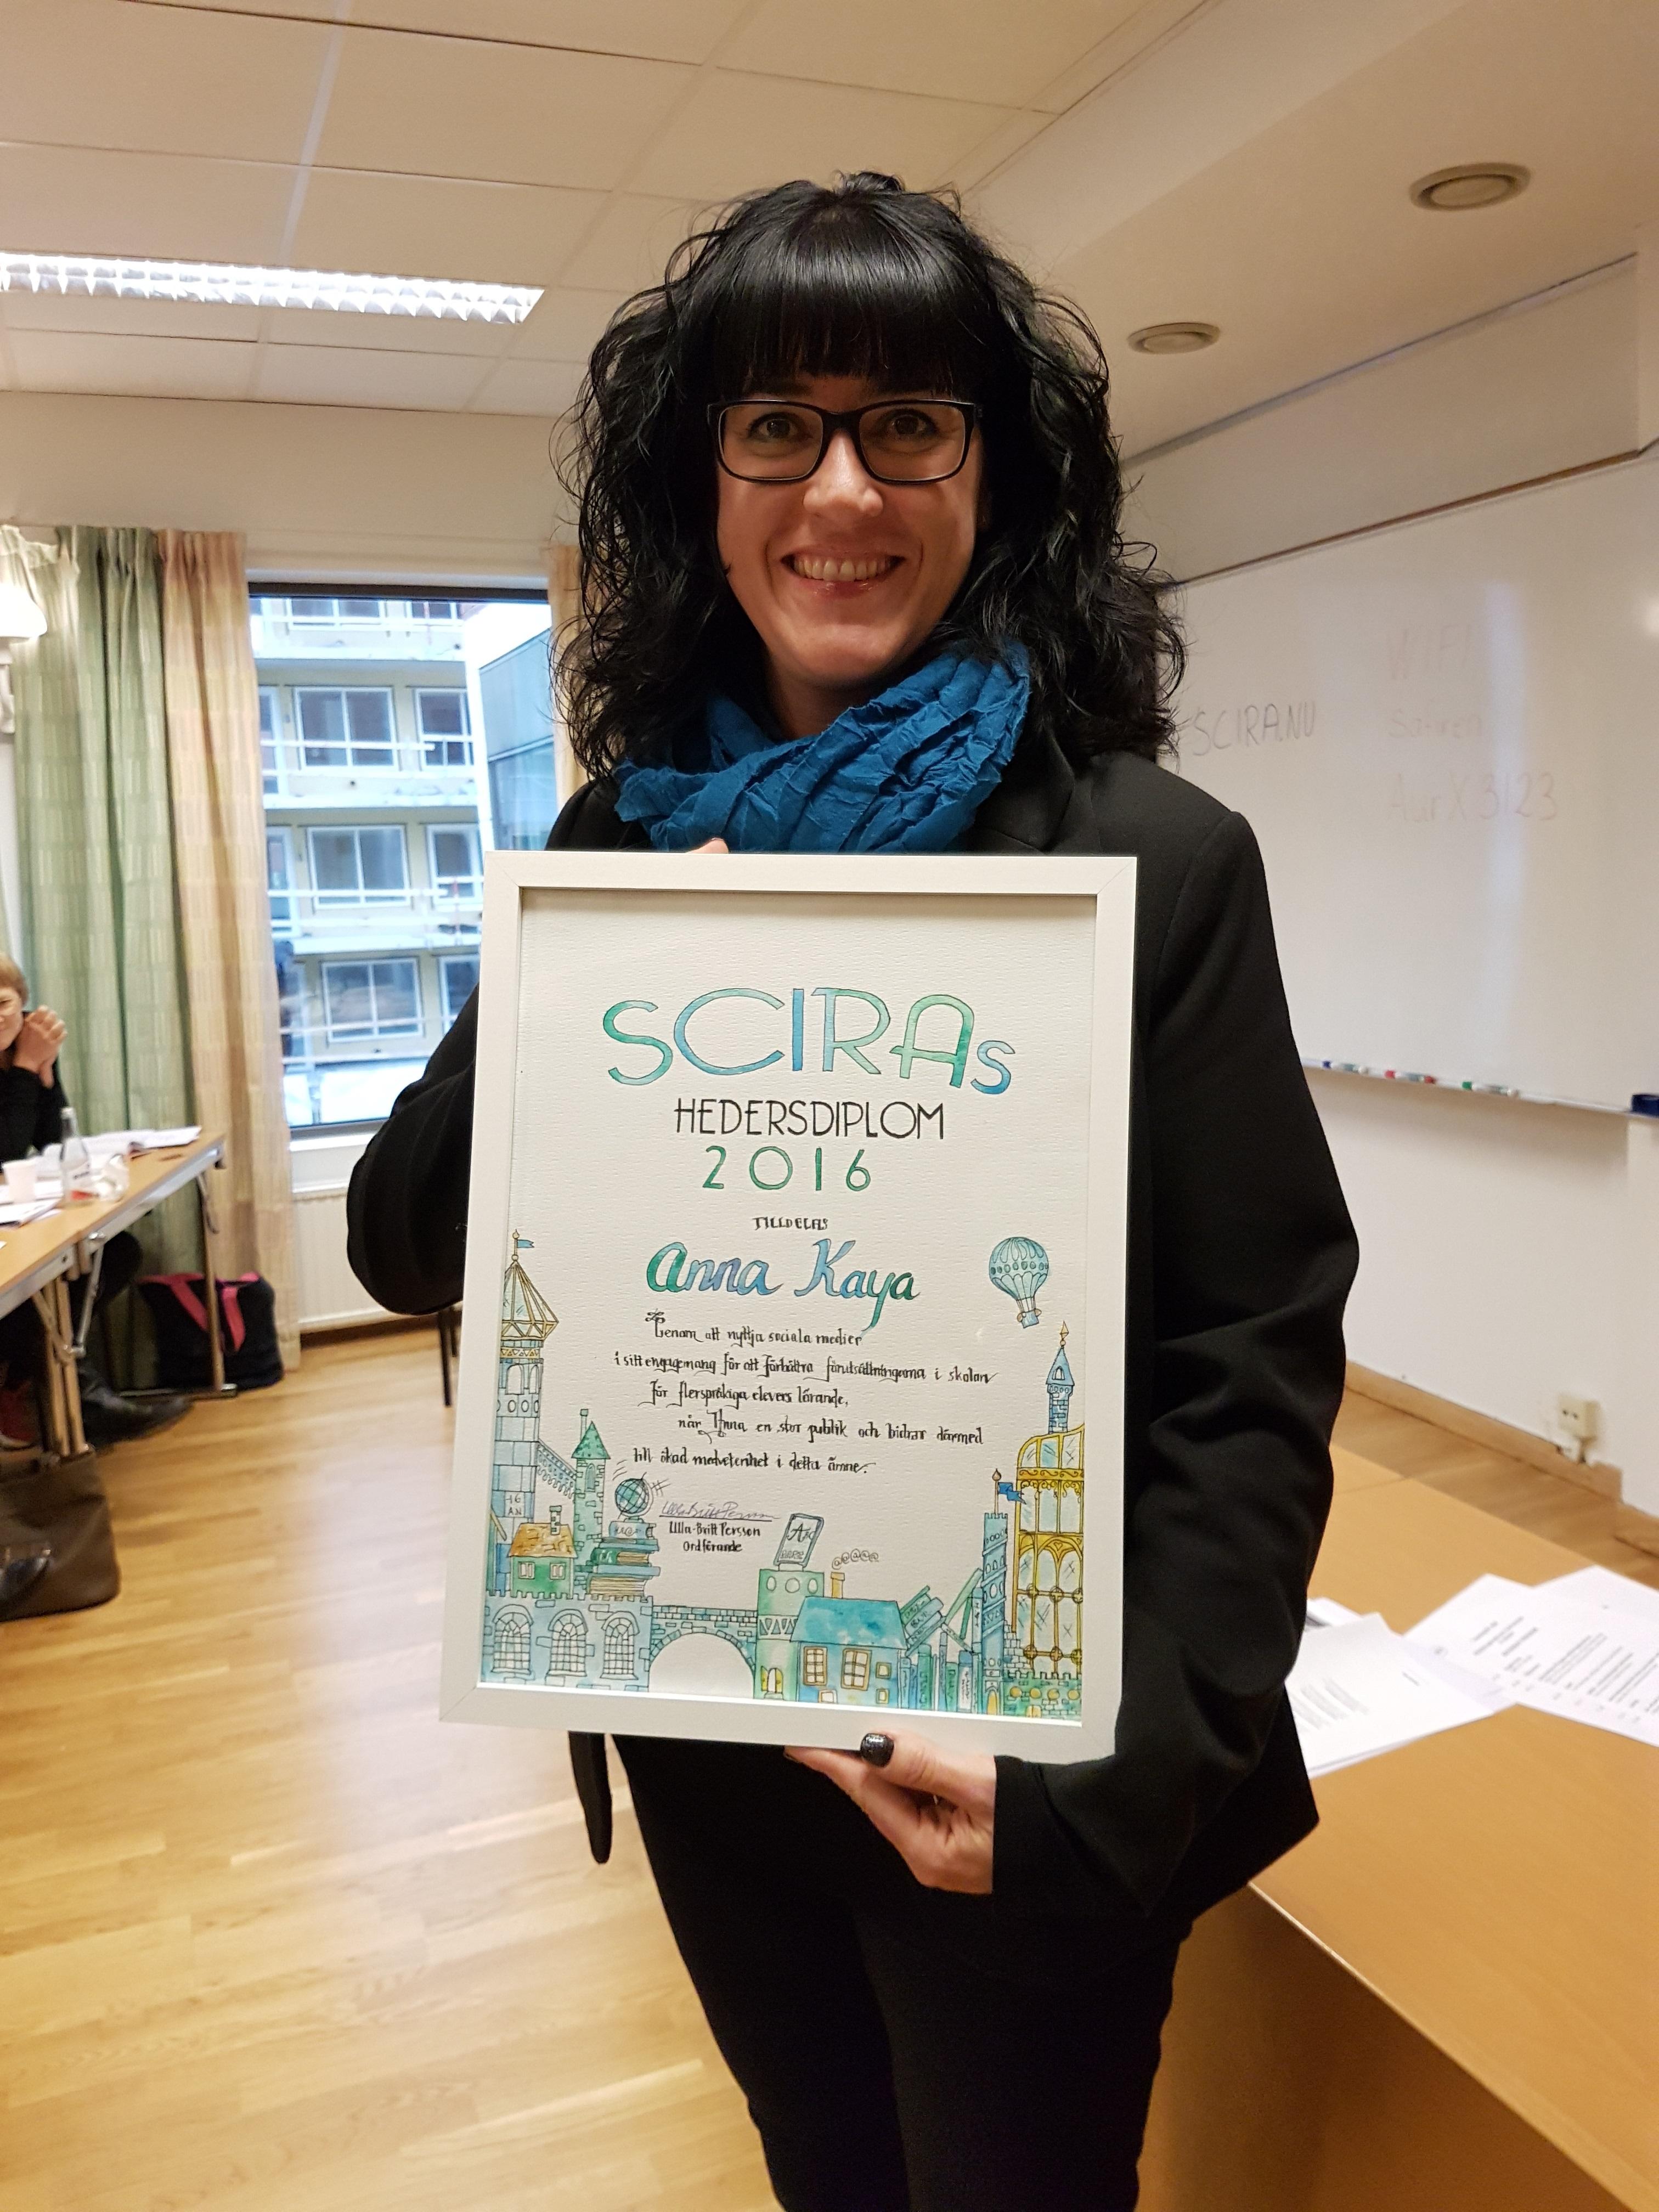 Anna Kaya tilldelas SCIRAS hedersdiplom 2016